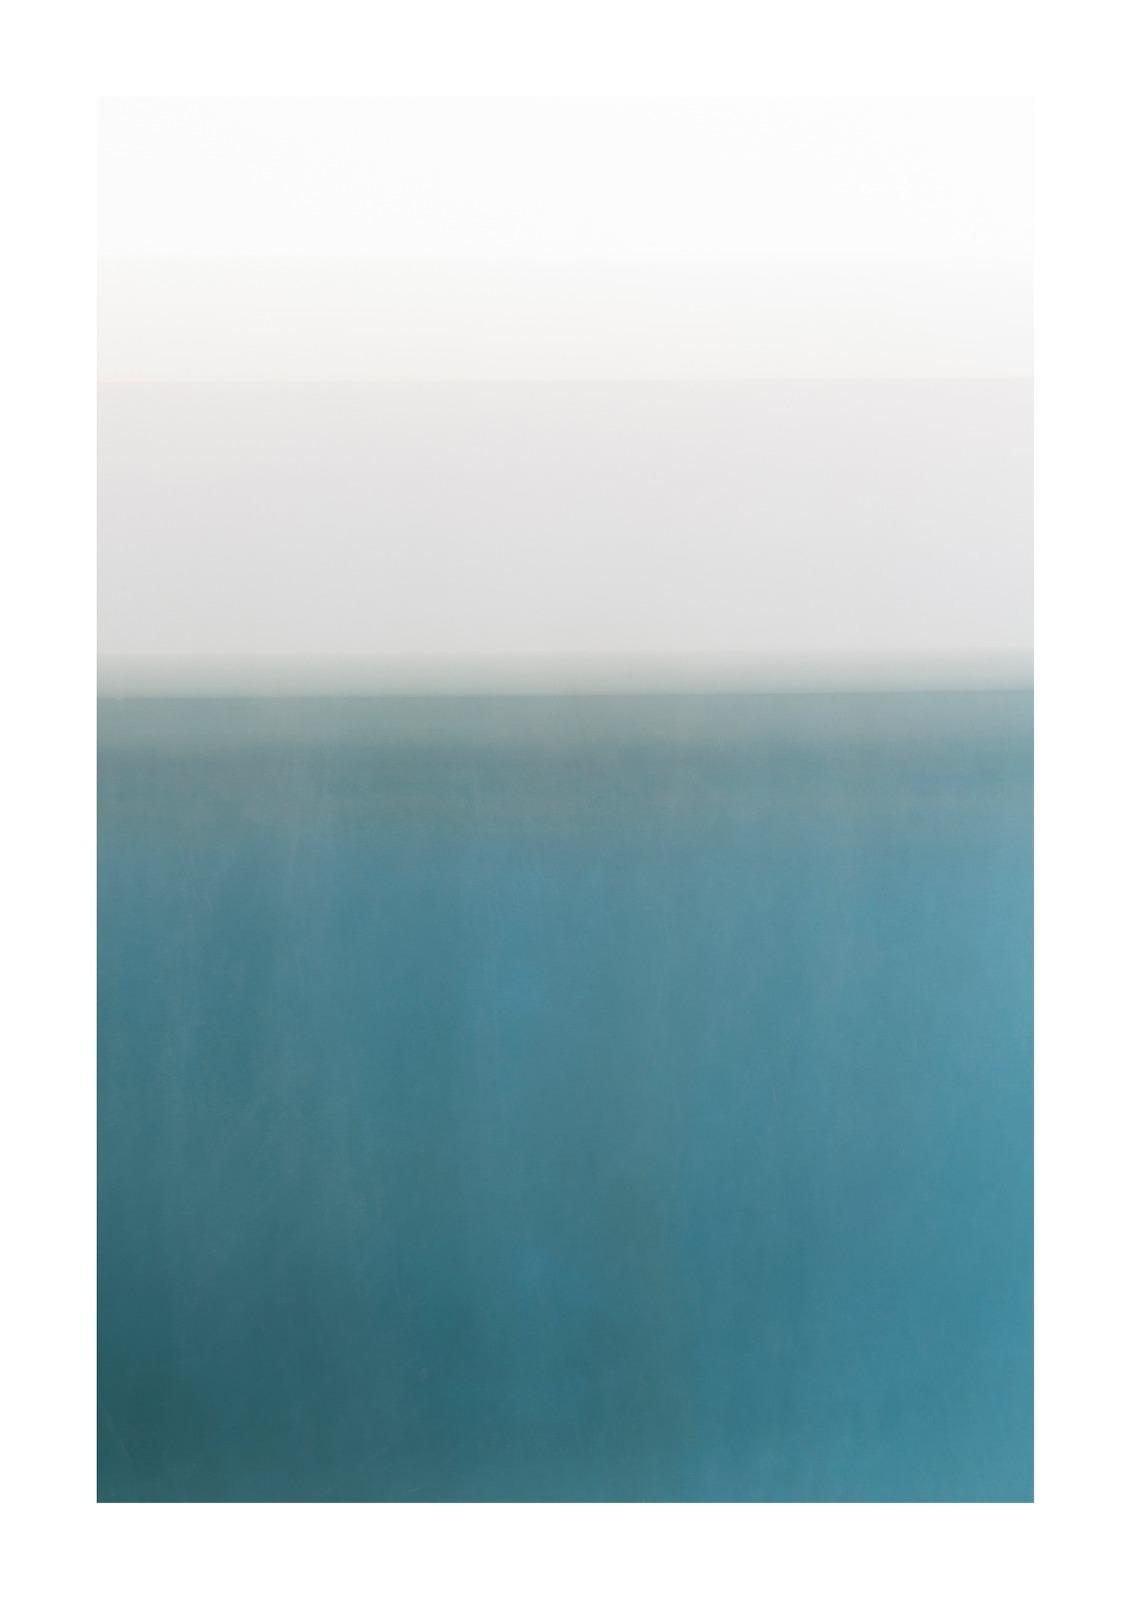 Blue No. 5 - Below The Waterline